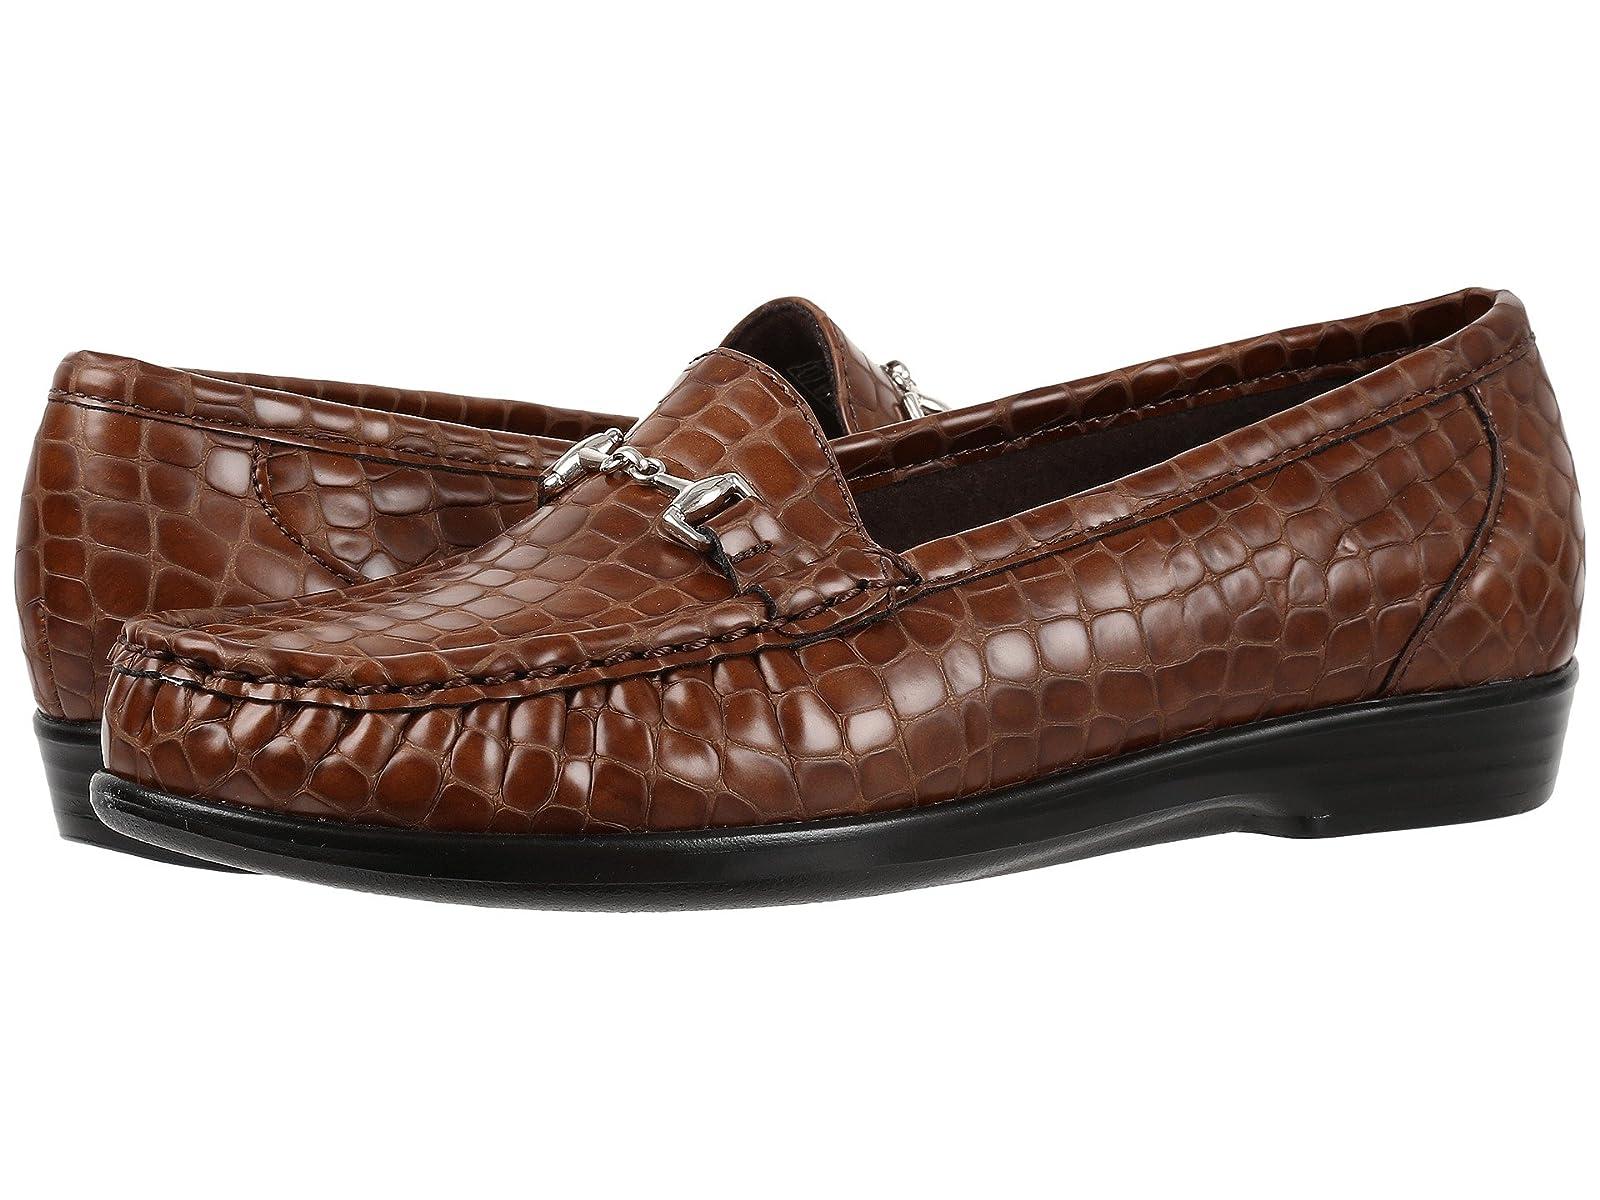 SAS MetroAtmospheric grades have affordable shoes